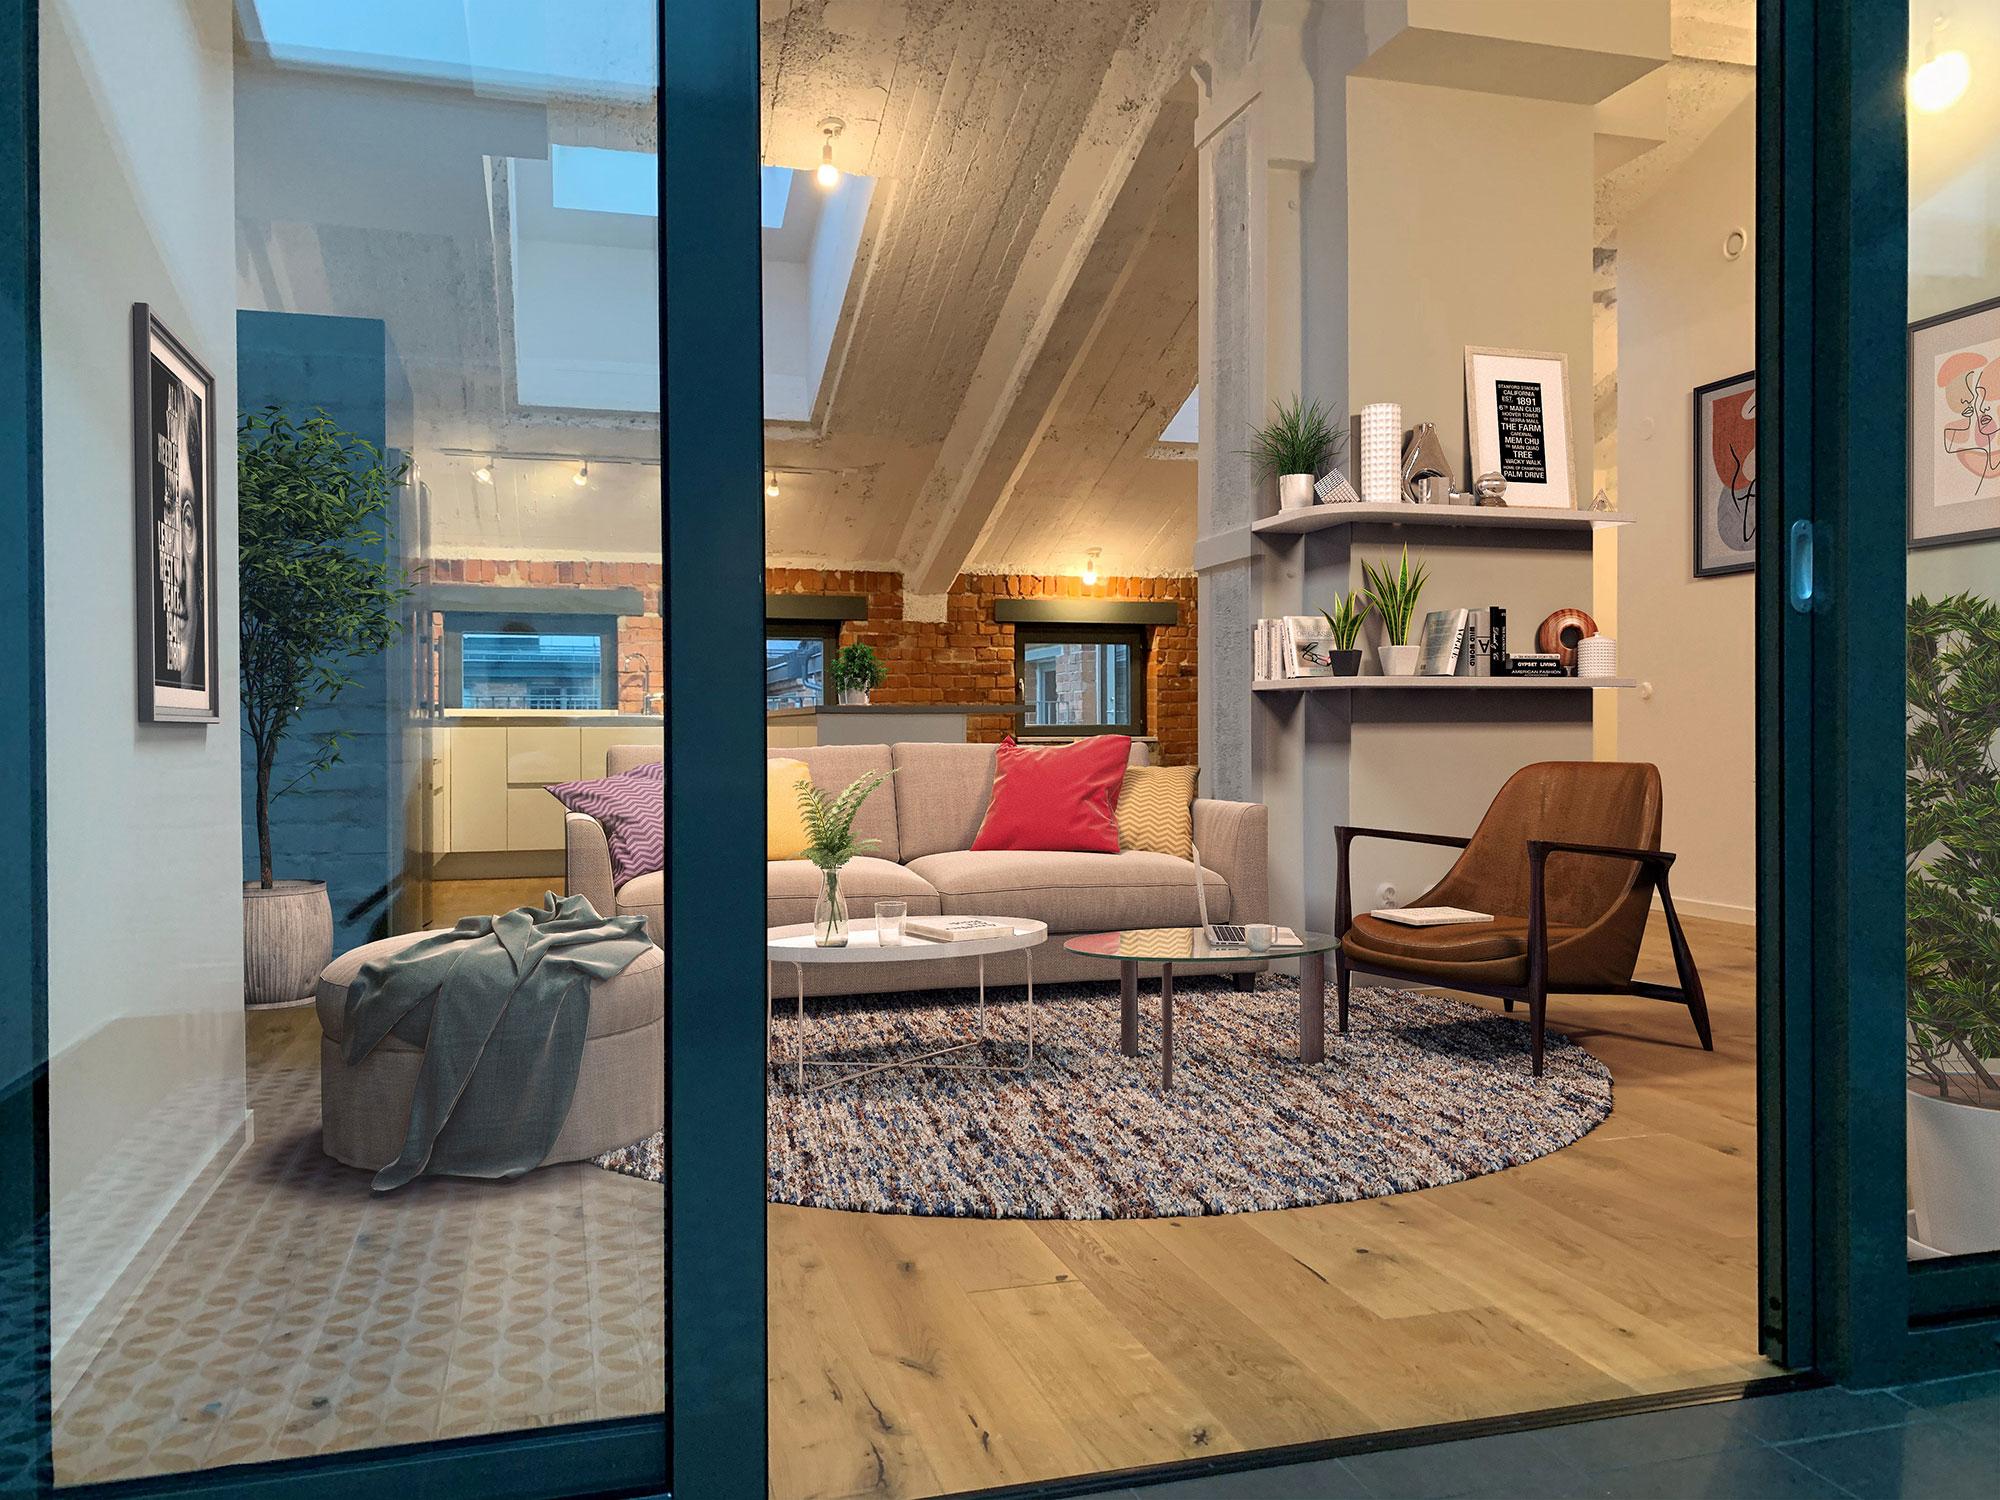 Ett mysigt möblerat vardagsrum öppnar upp sig bakom glasdörrar